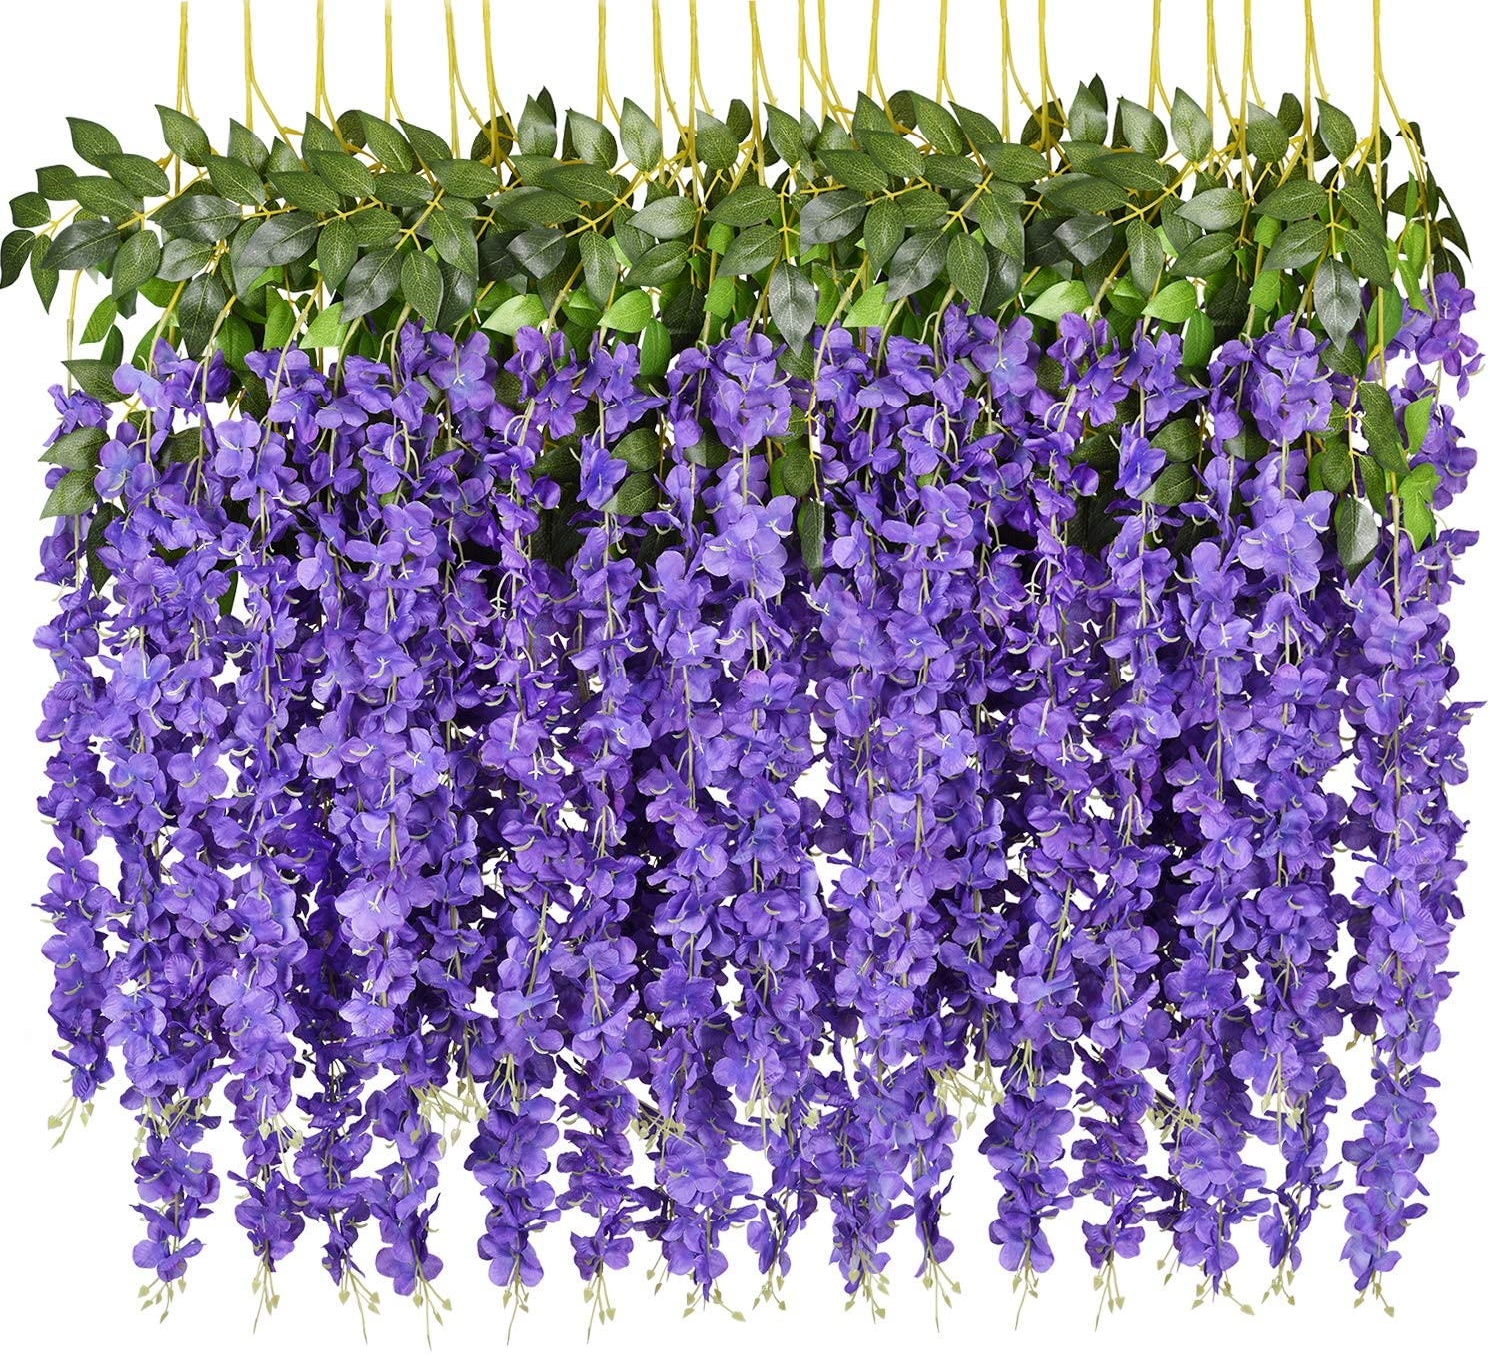 6 Pack 3.75 Feet/Piece Artificial Fake Wisteria Vine Ratta Hanging Garland Silk Flowers String Home Party Wedding Decor (Purple)